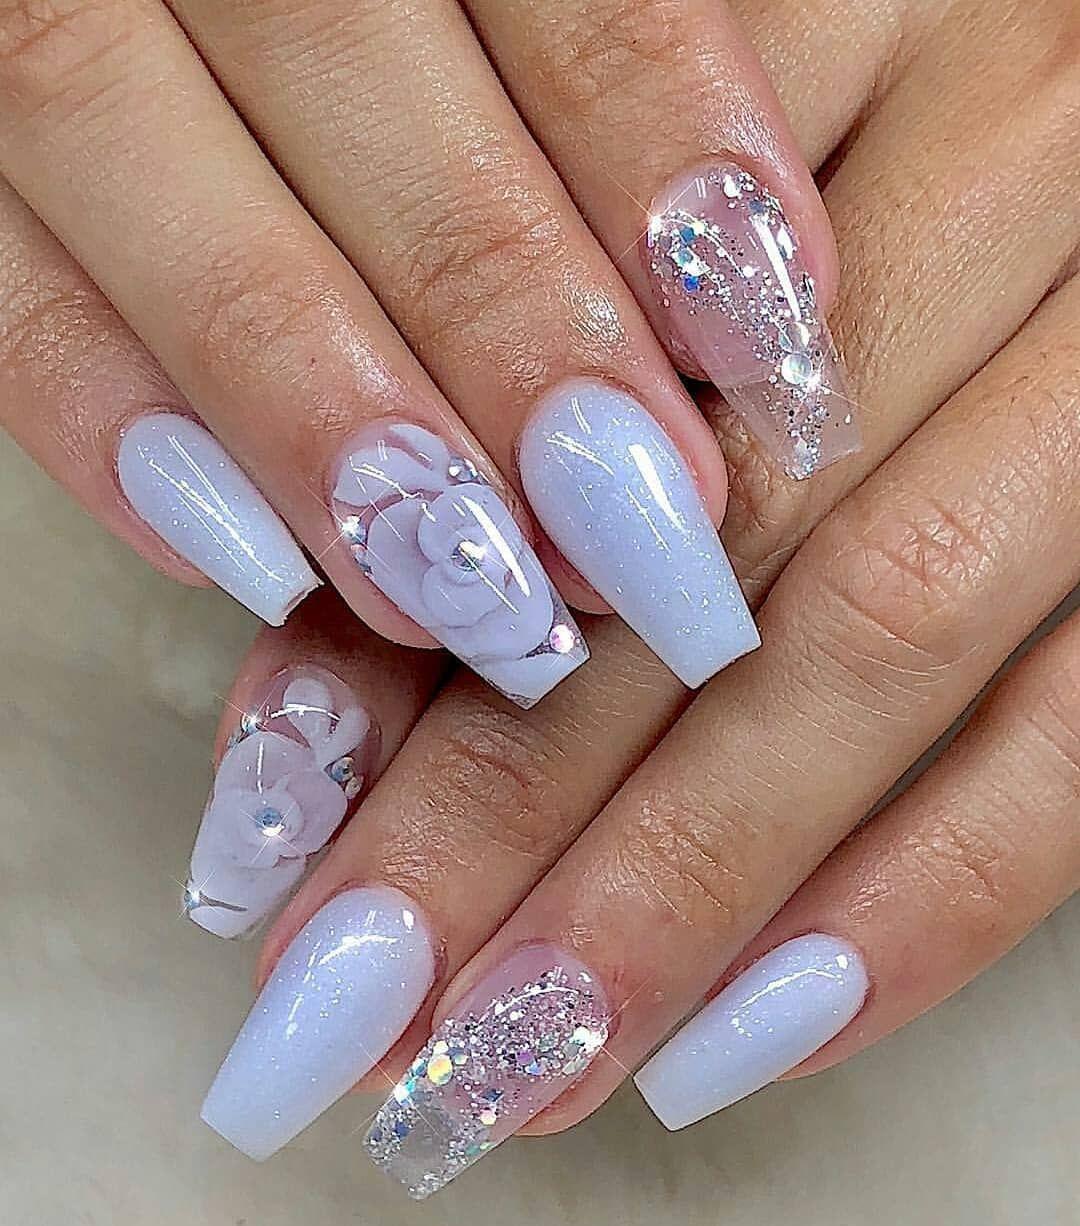 30 Cute Nail Design Ideas For Stylish Brides Wedding Forward Square Nail Designs Short Square Nails Nail Art Wedding